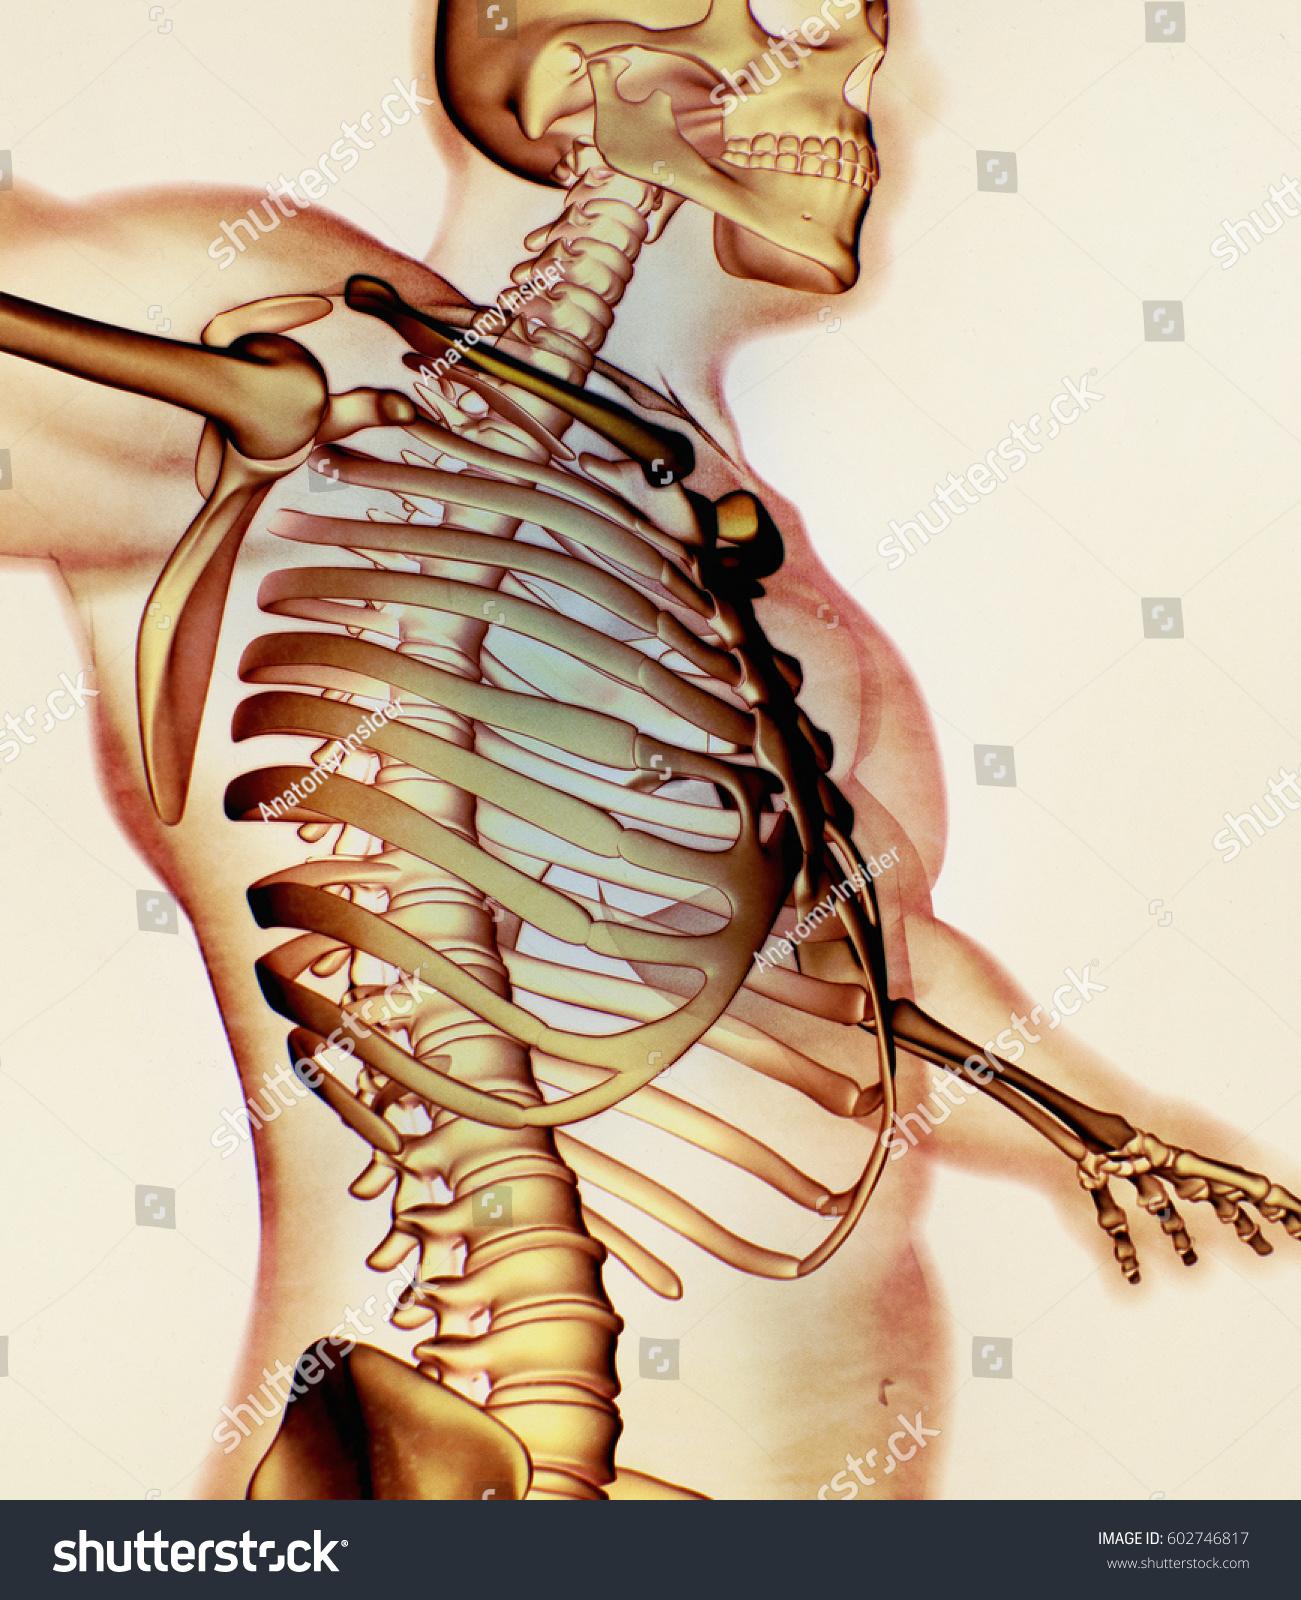 Xray Image Human Anatomy Torso Skeletal Stock Illustration 602746817